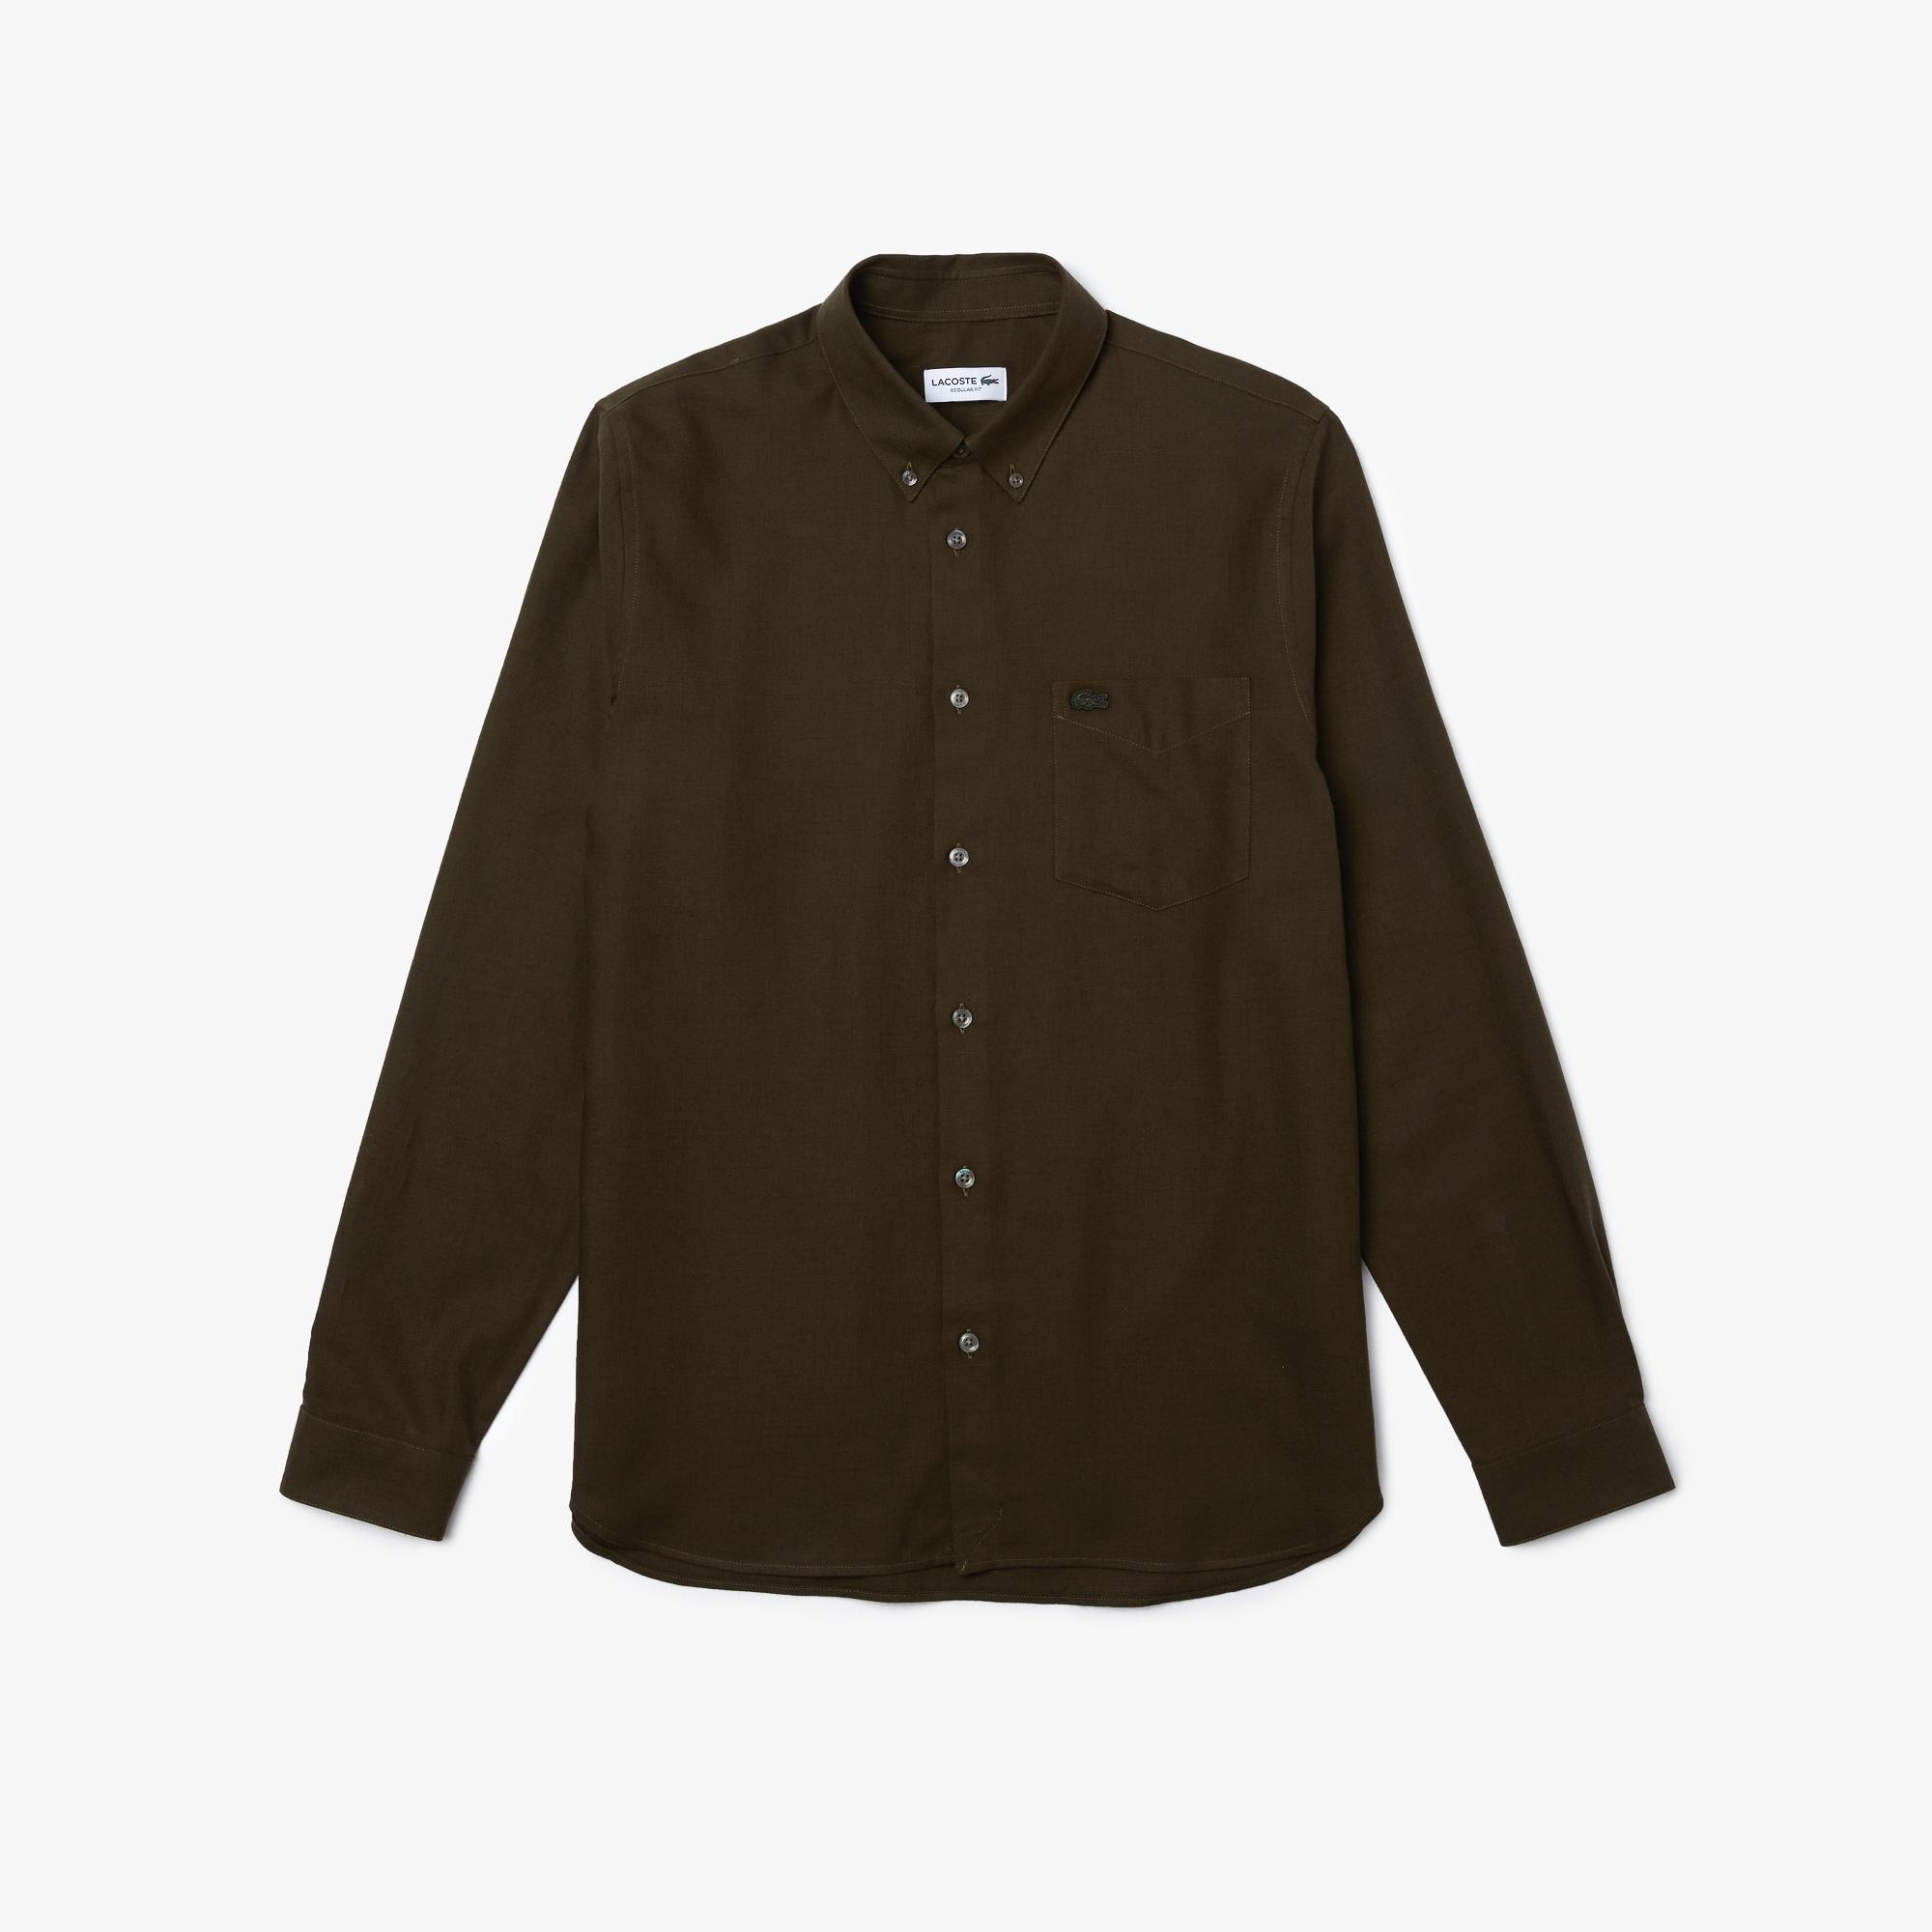 Lacoste Męska Wełniano-Bawełniana Koszula Regular Fit